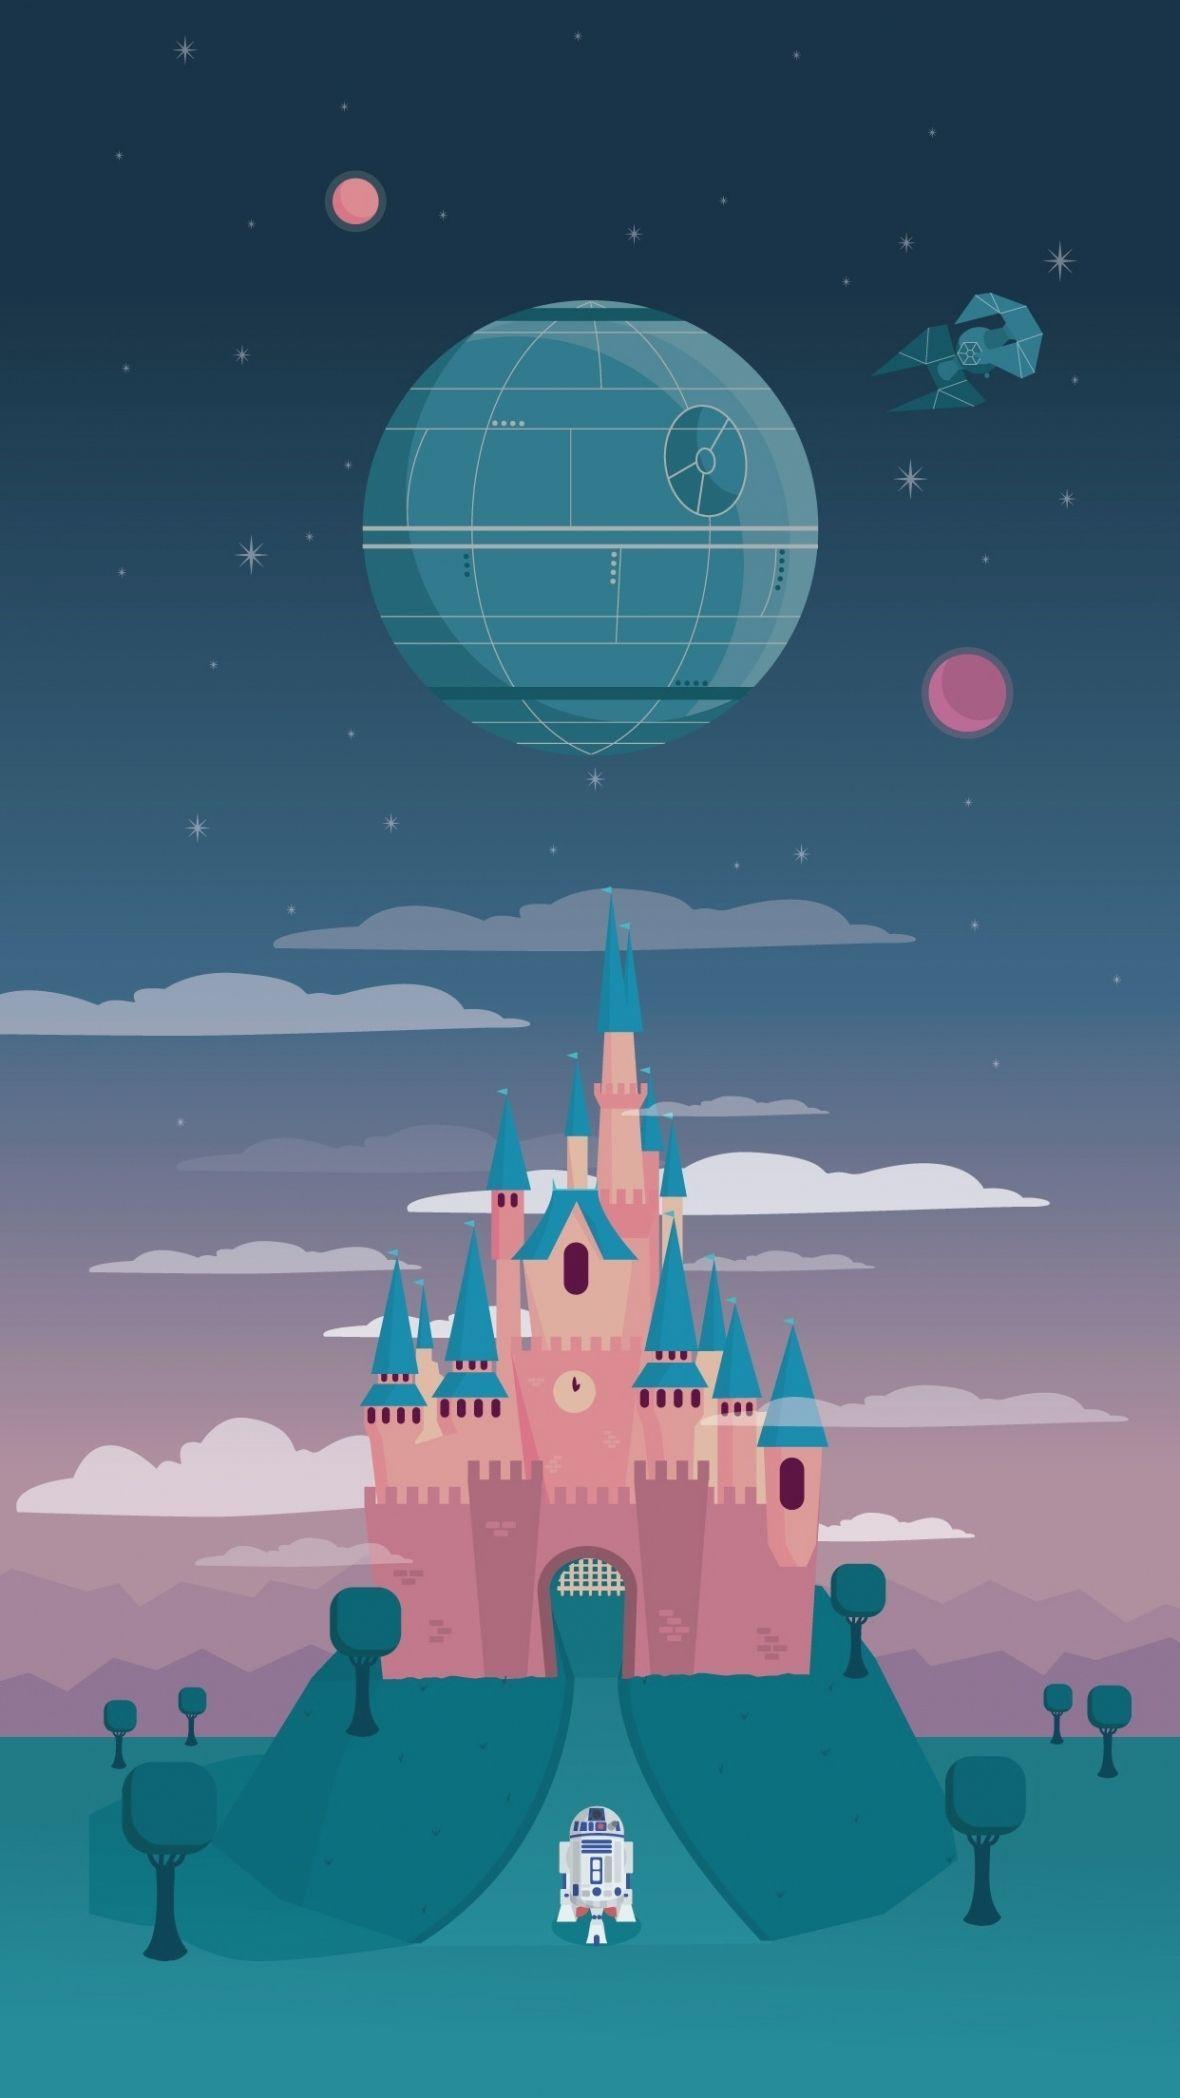 Image Result For Disney Tumblr Wallpaper Iphone Disney Star Wars Wallpaper Disney Phone Wallpaper